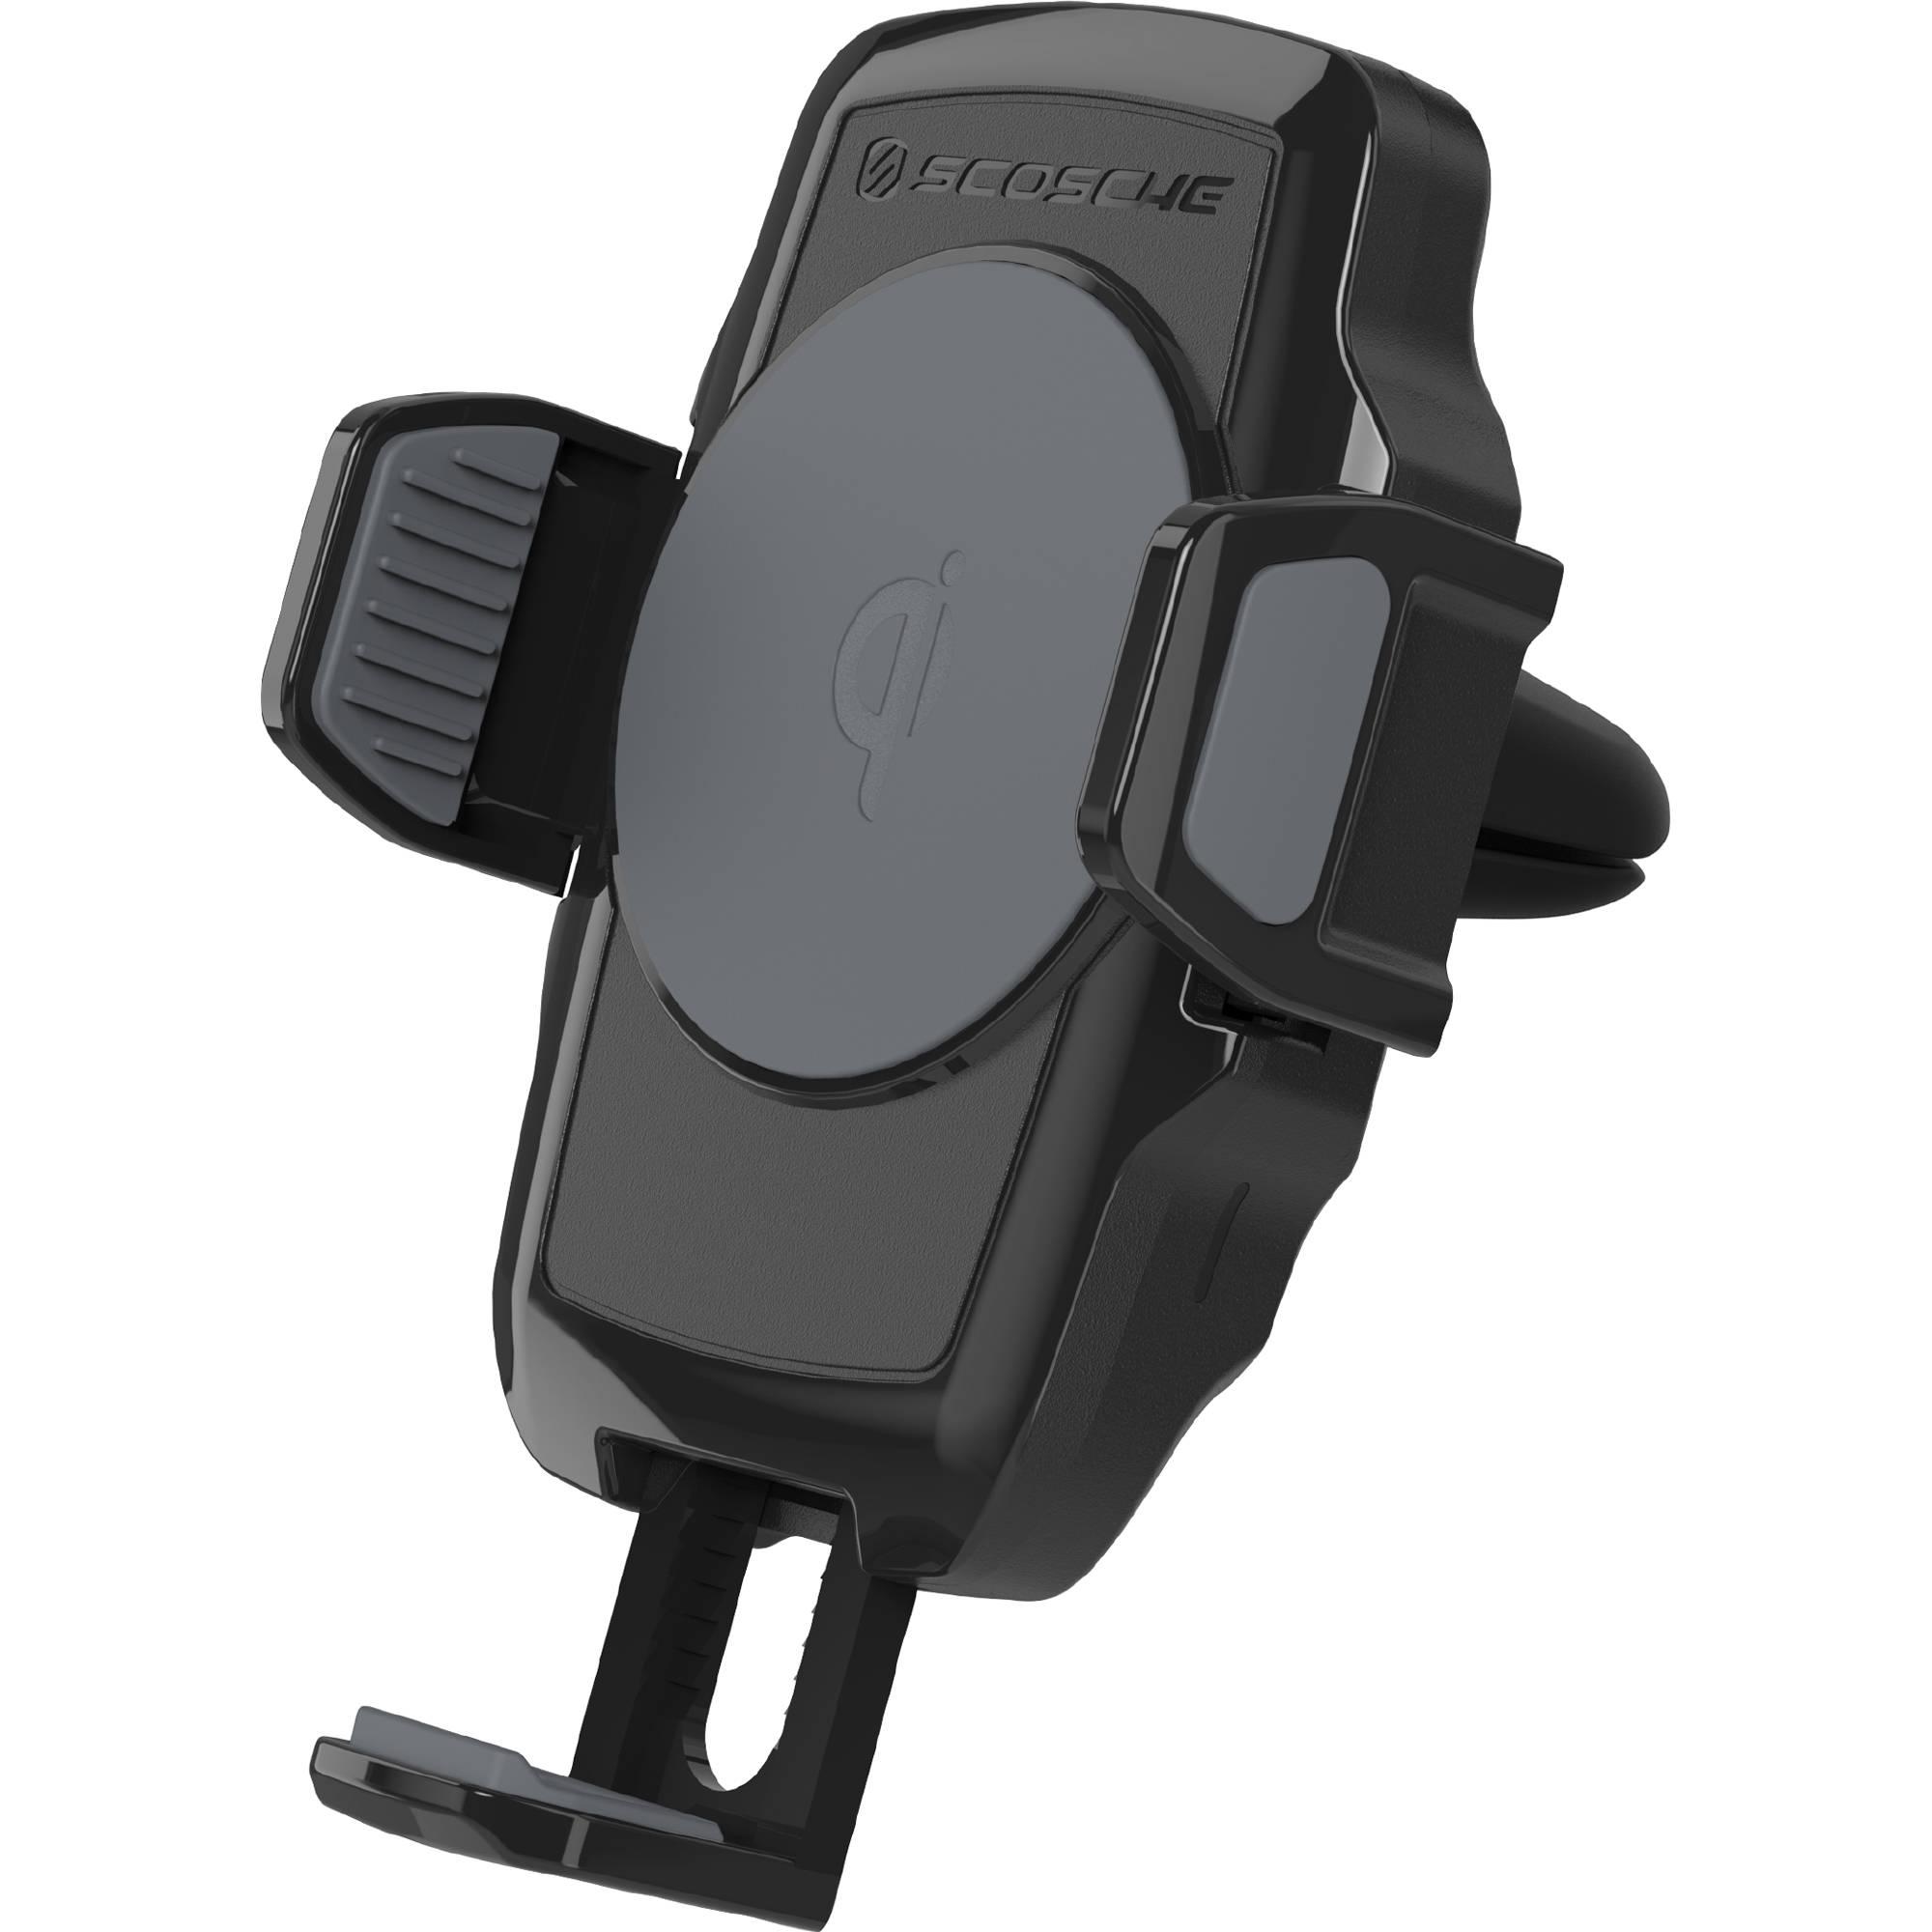 Scosche MagicMount VentMount Qi Wireless Charging Car VQ2M-ST1